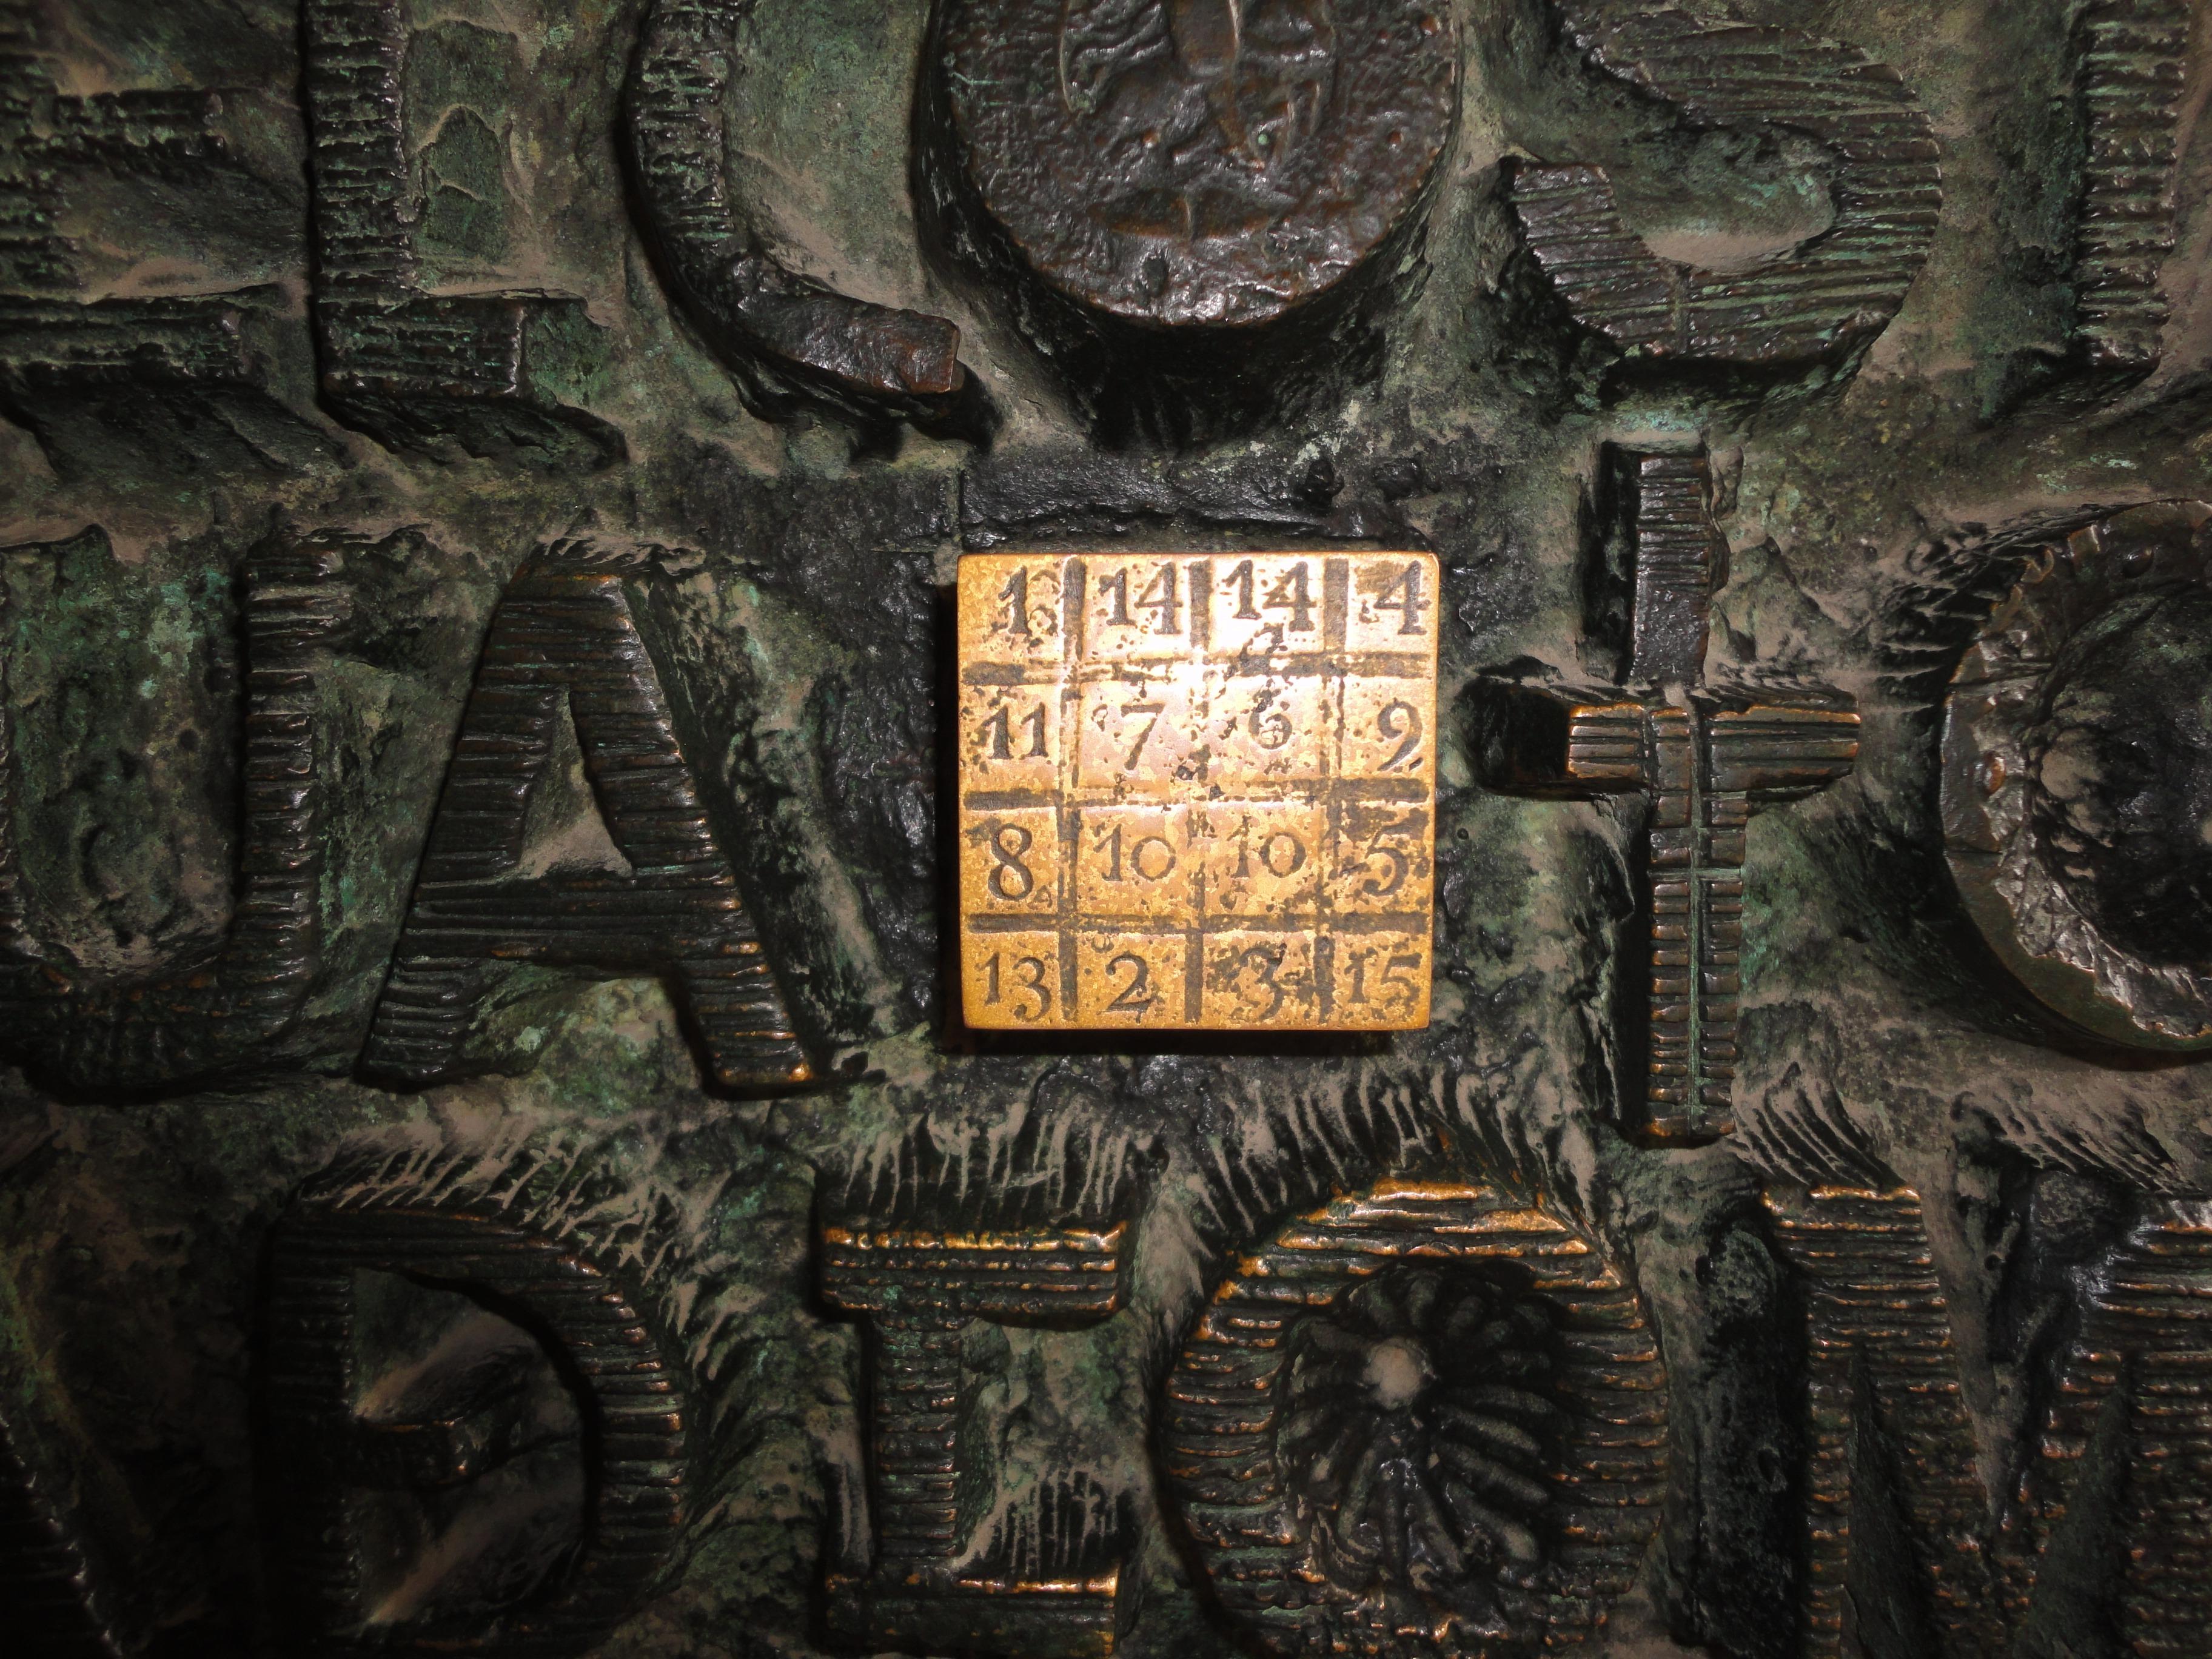 madera barcelona art templo gaud tallado alivio captura de pantalla sagrada familia sitio arqueolgico historia antigua